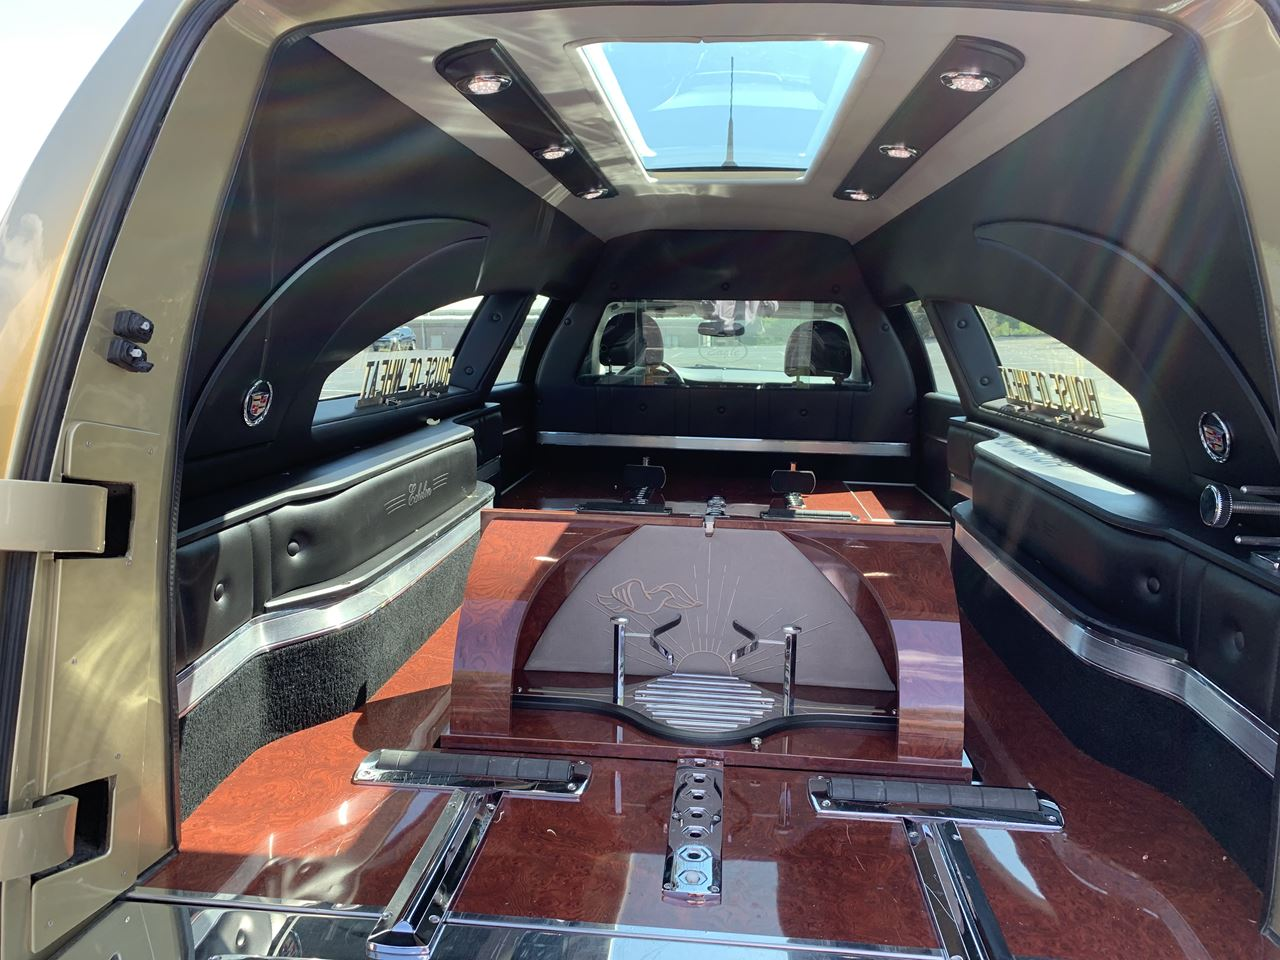 2013 Eagle Cadillac Echelon Hearse For Sale Near Me